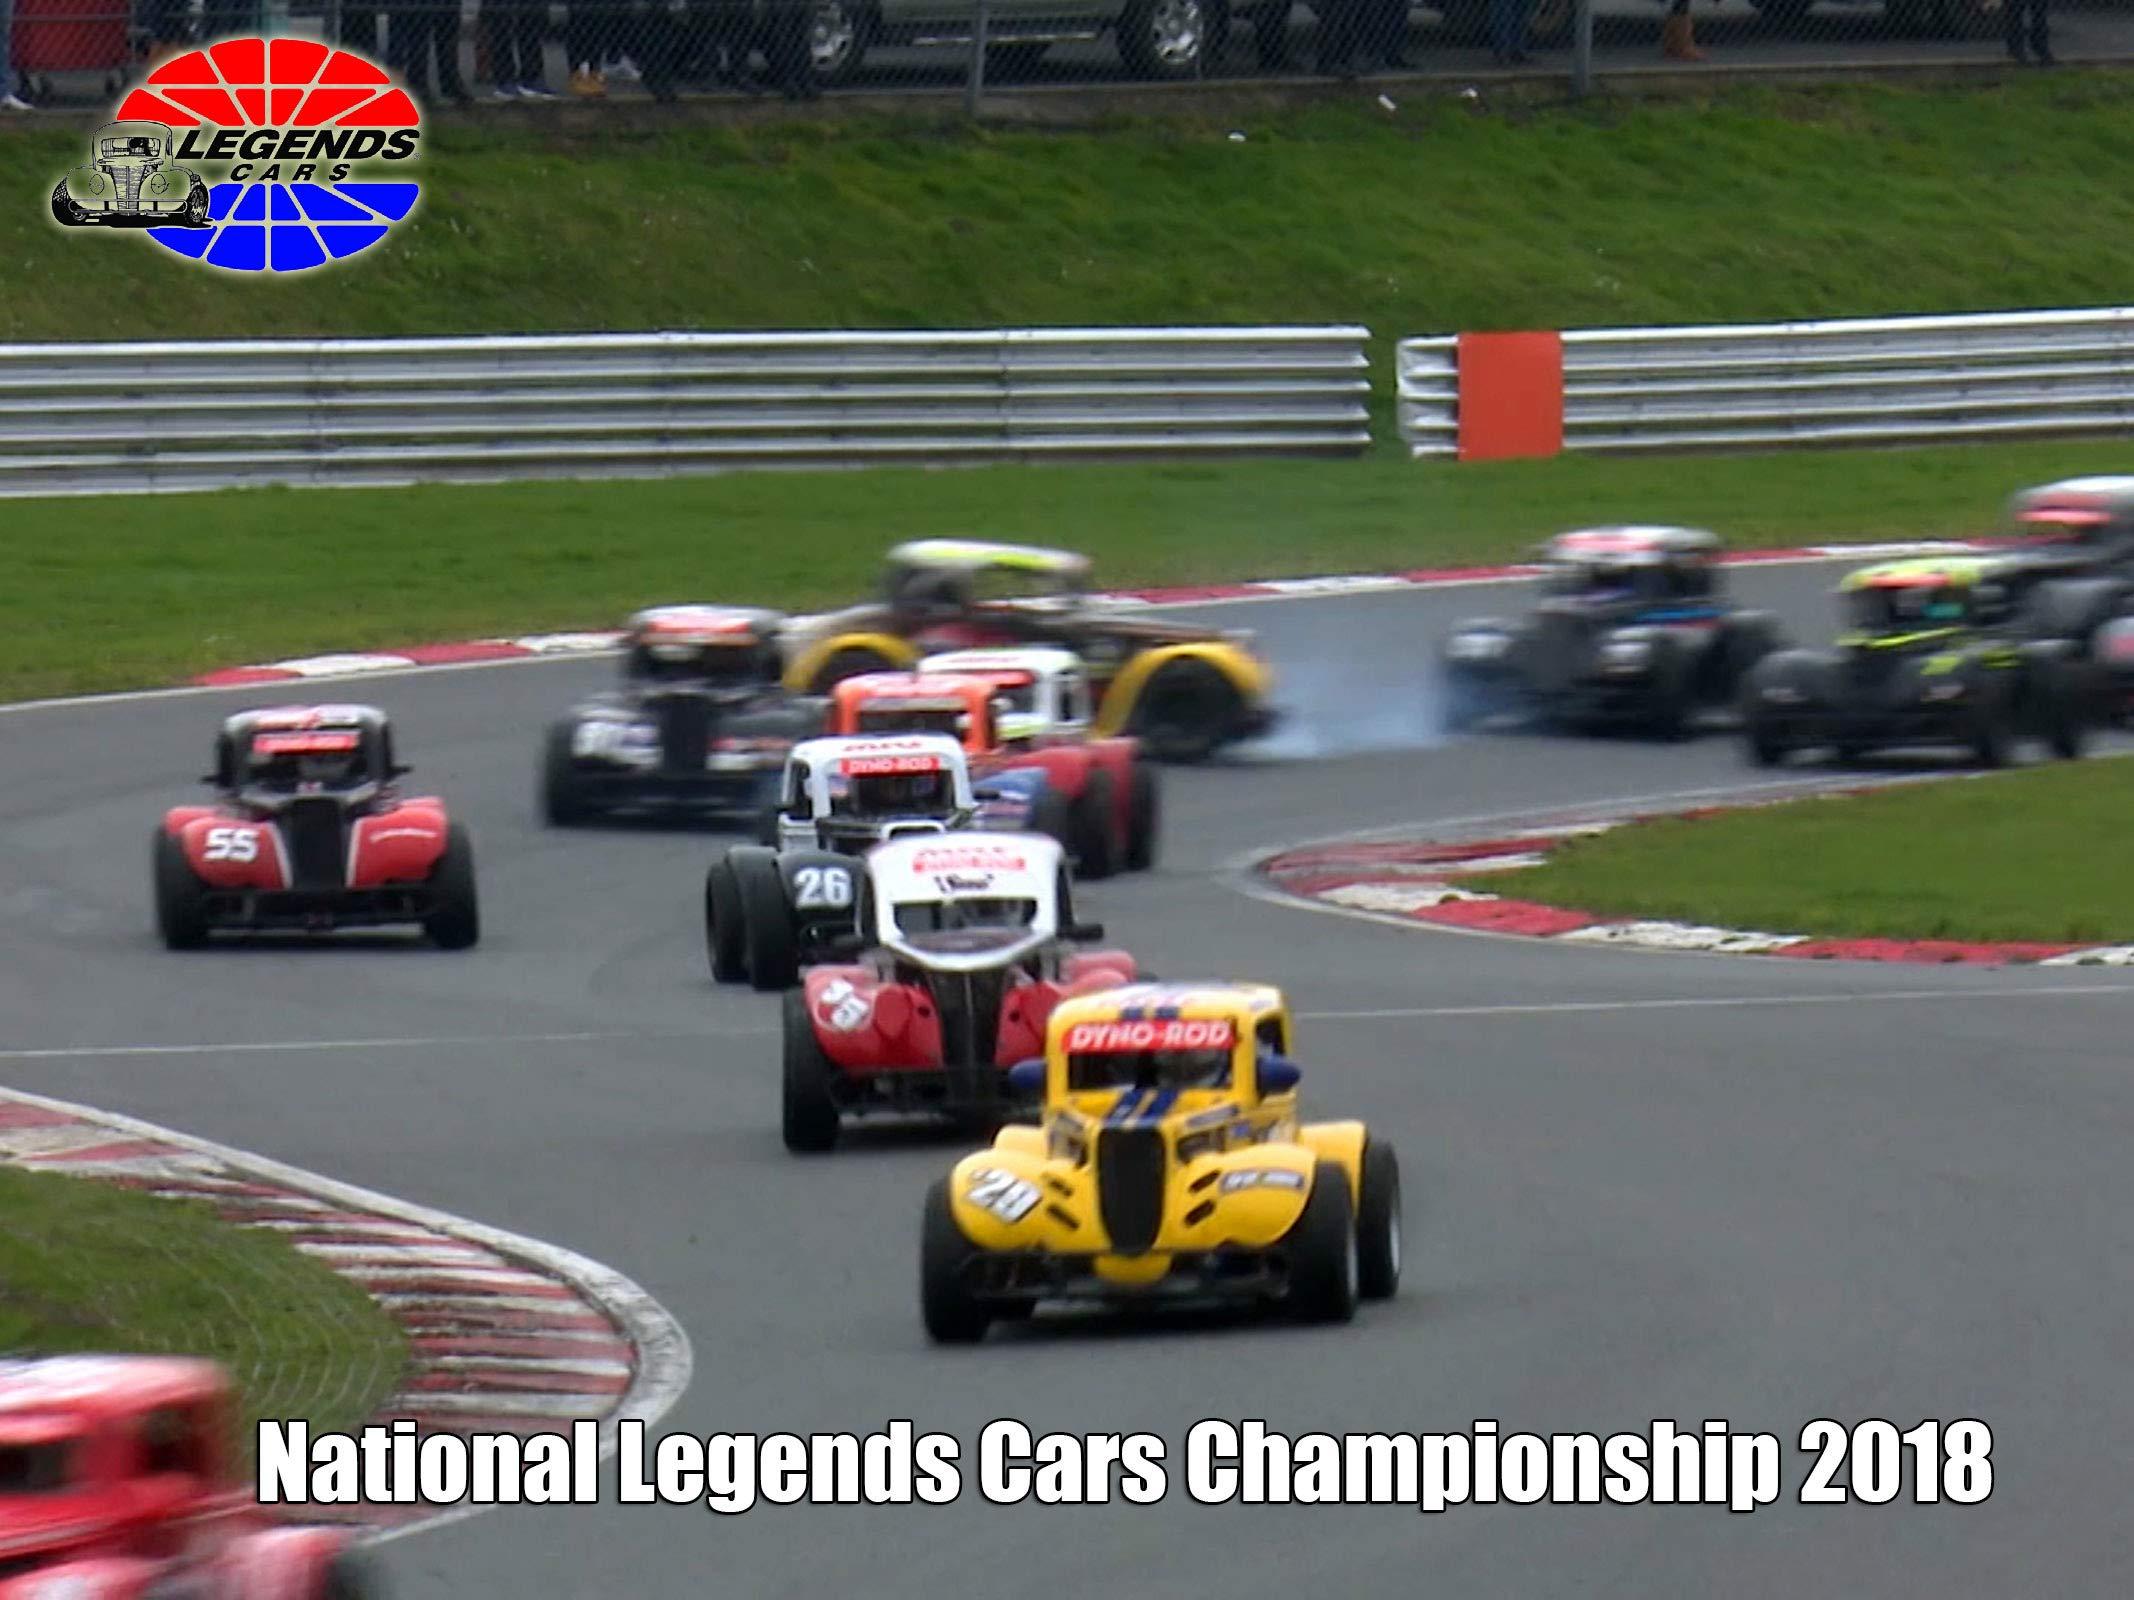 National Legends Cars Championship - Season 1